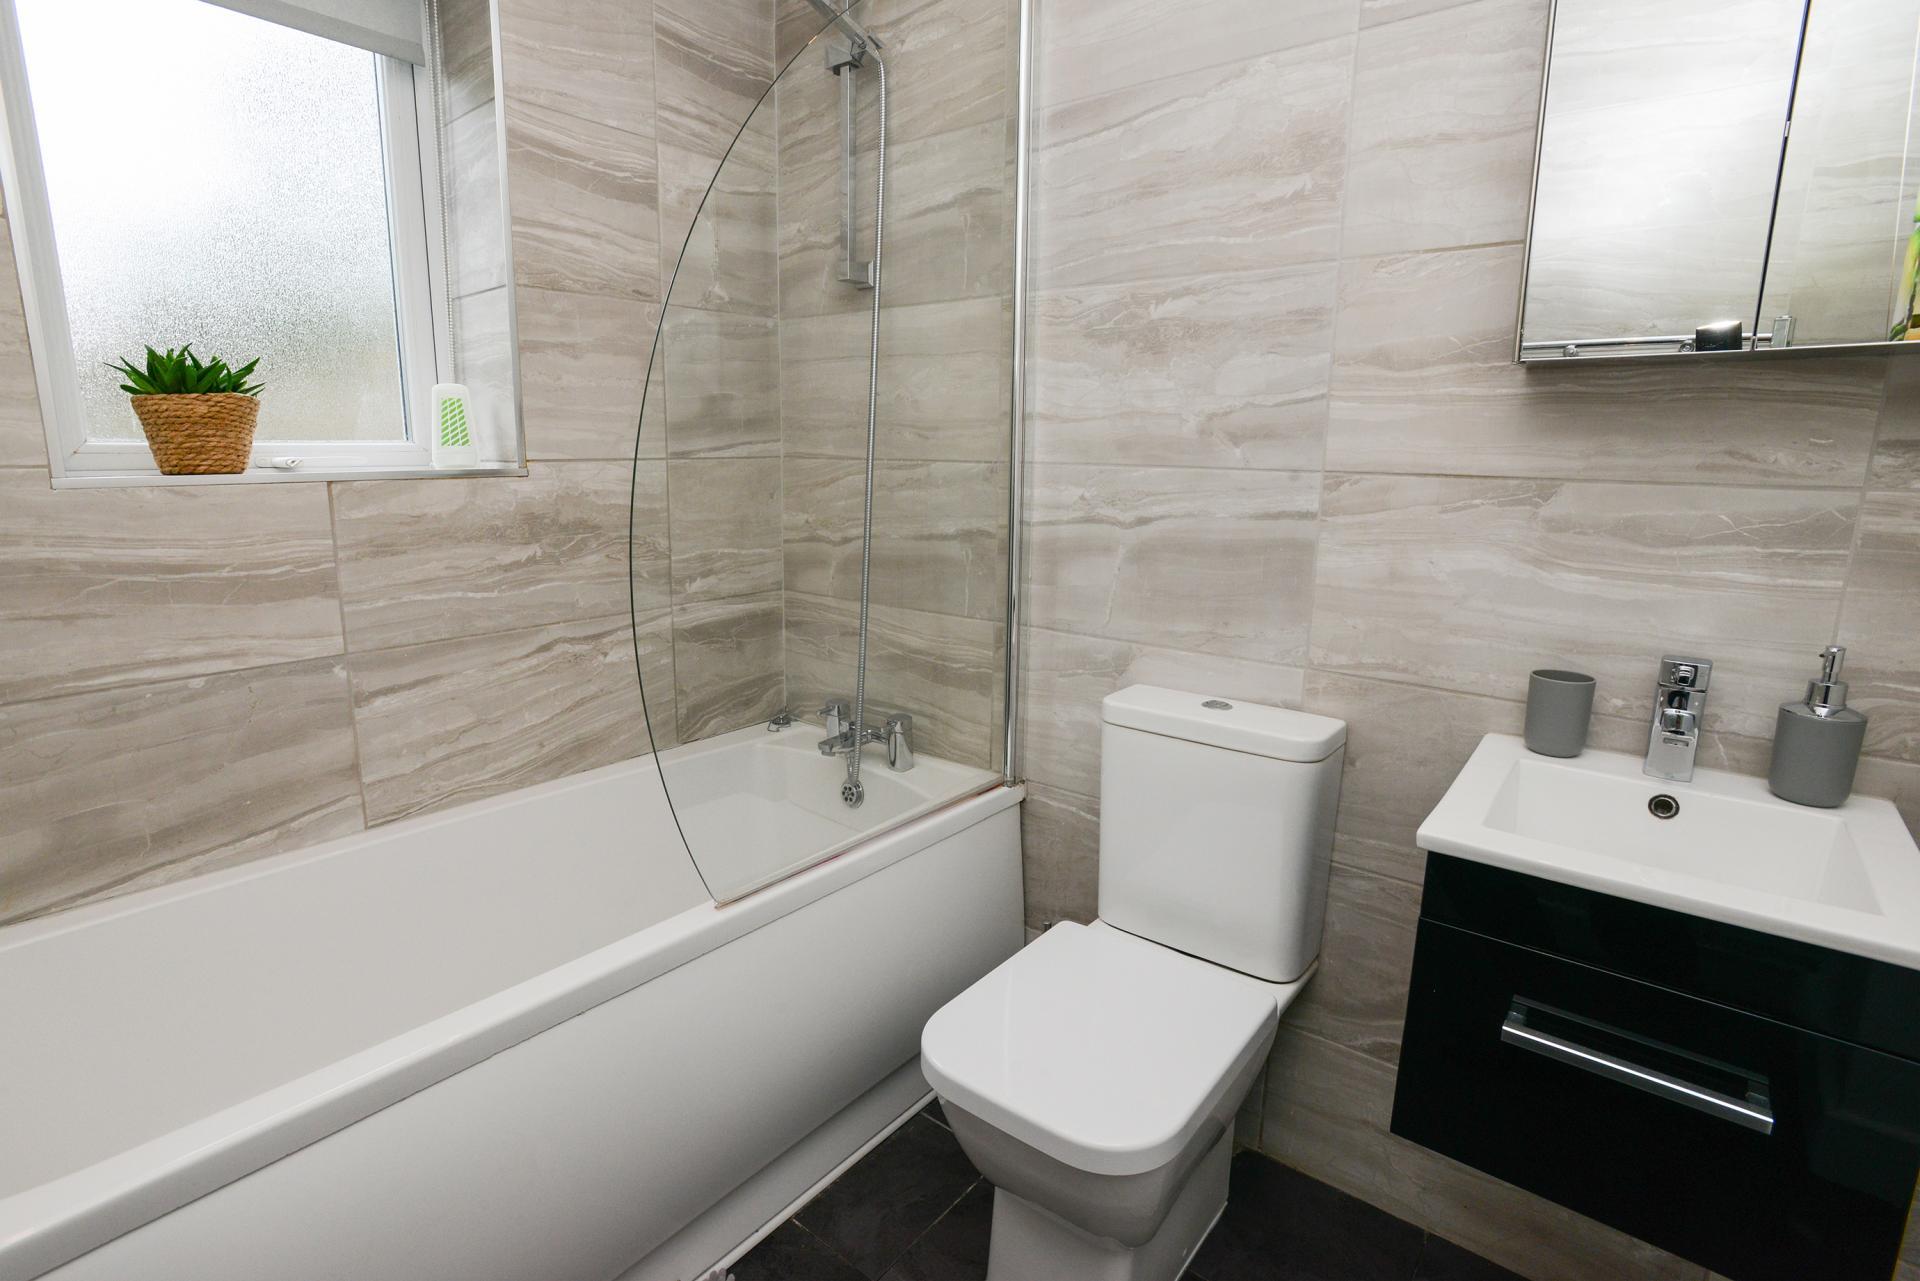 Bathroom at Beeston House, Beeston, Nottingham - Citybase Apartments